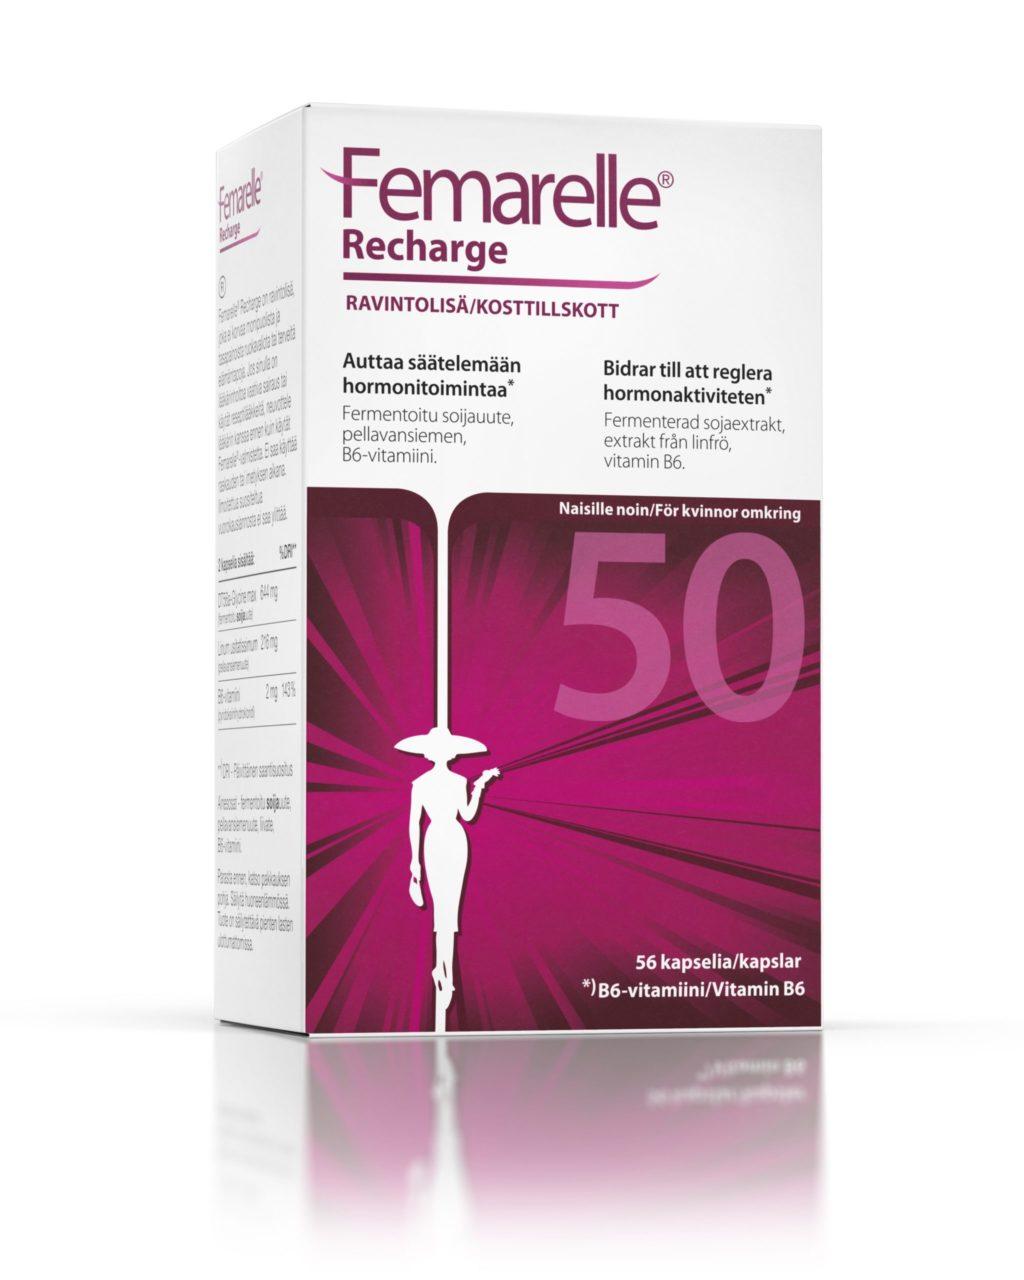 2019-Femarelle-Recharge-FI-sida_Spegling-scaled-e1588164321869